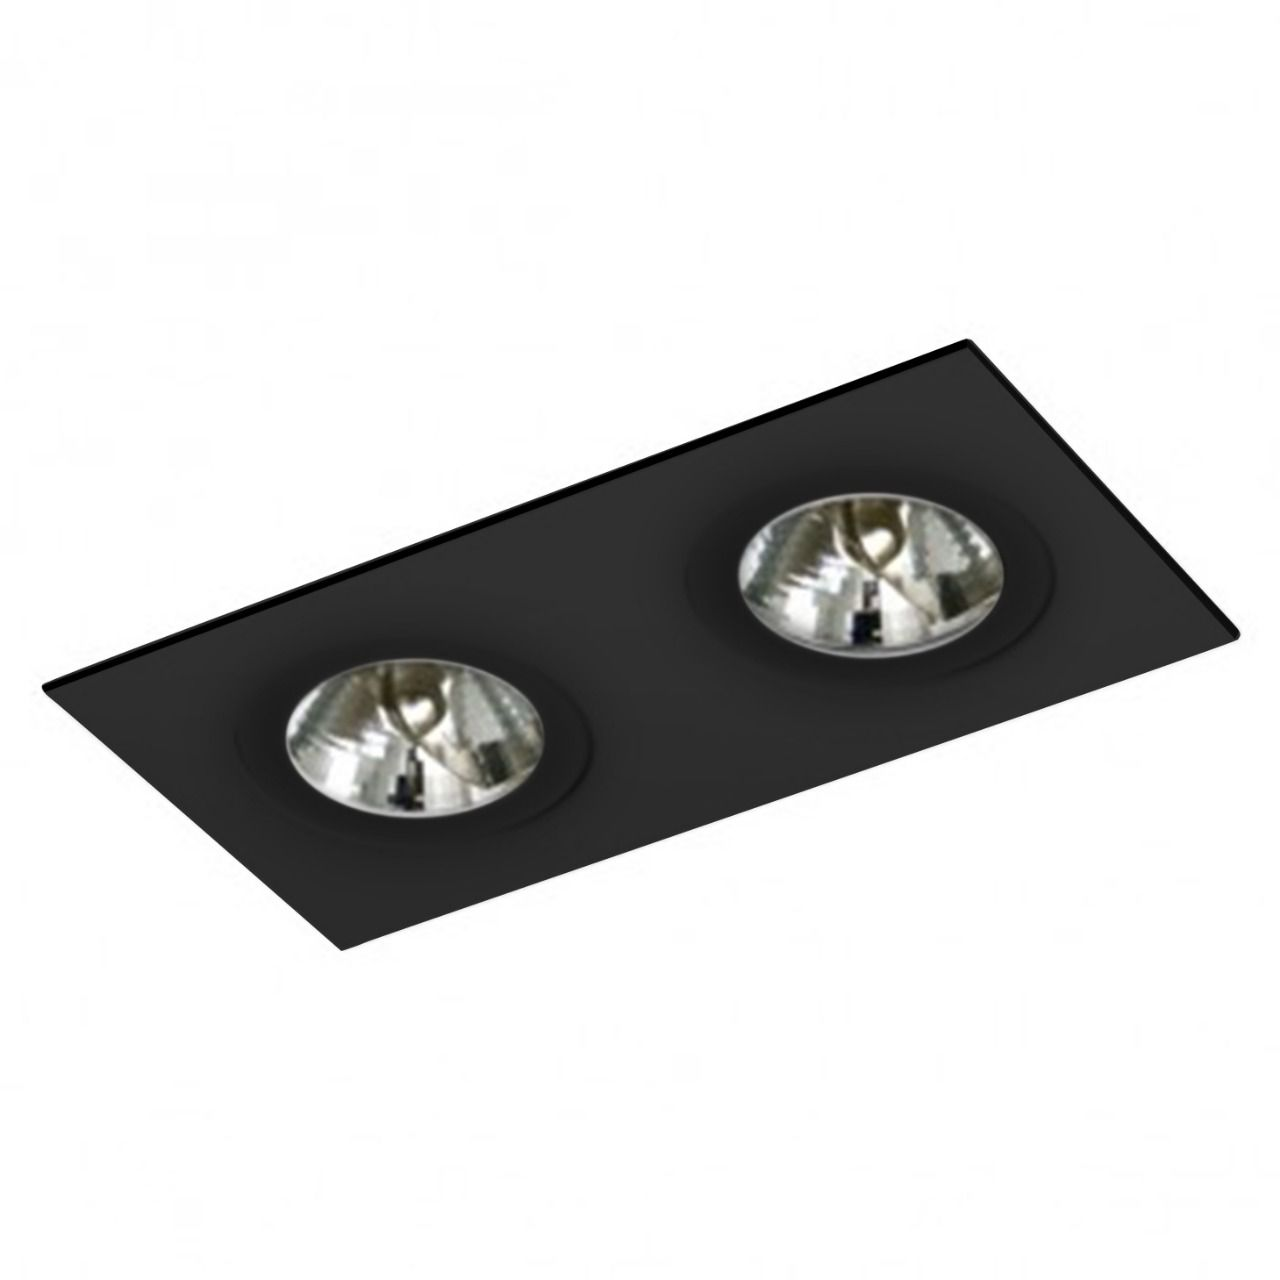 Spot Embutir Direcionavel P/ 2 Lampadas Par20/AR70 BL1086/2  - 9led